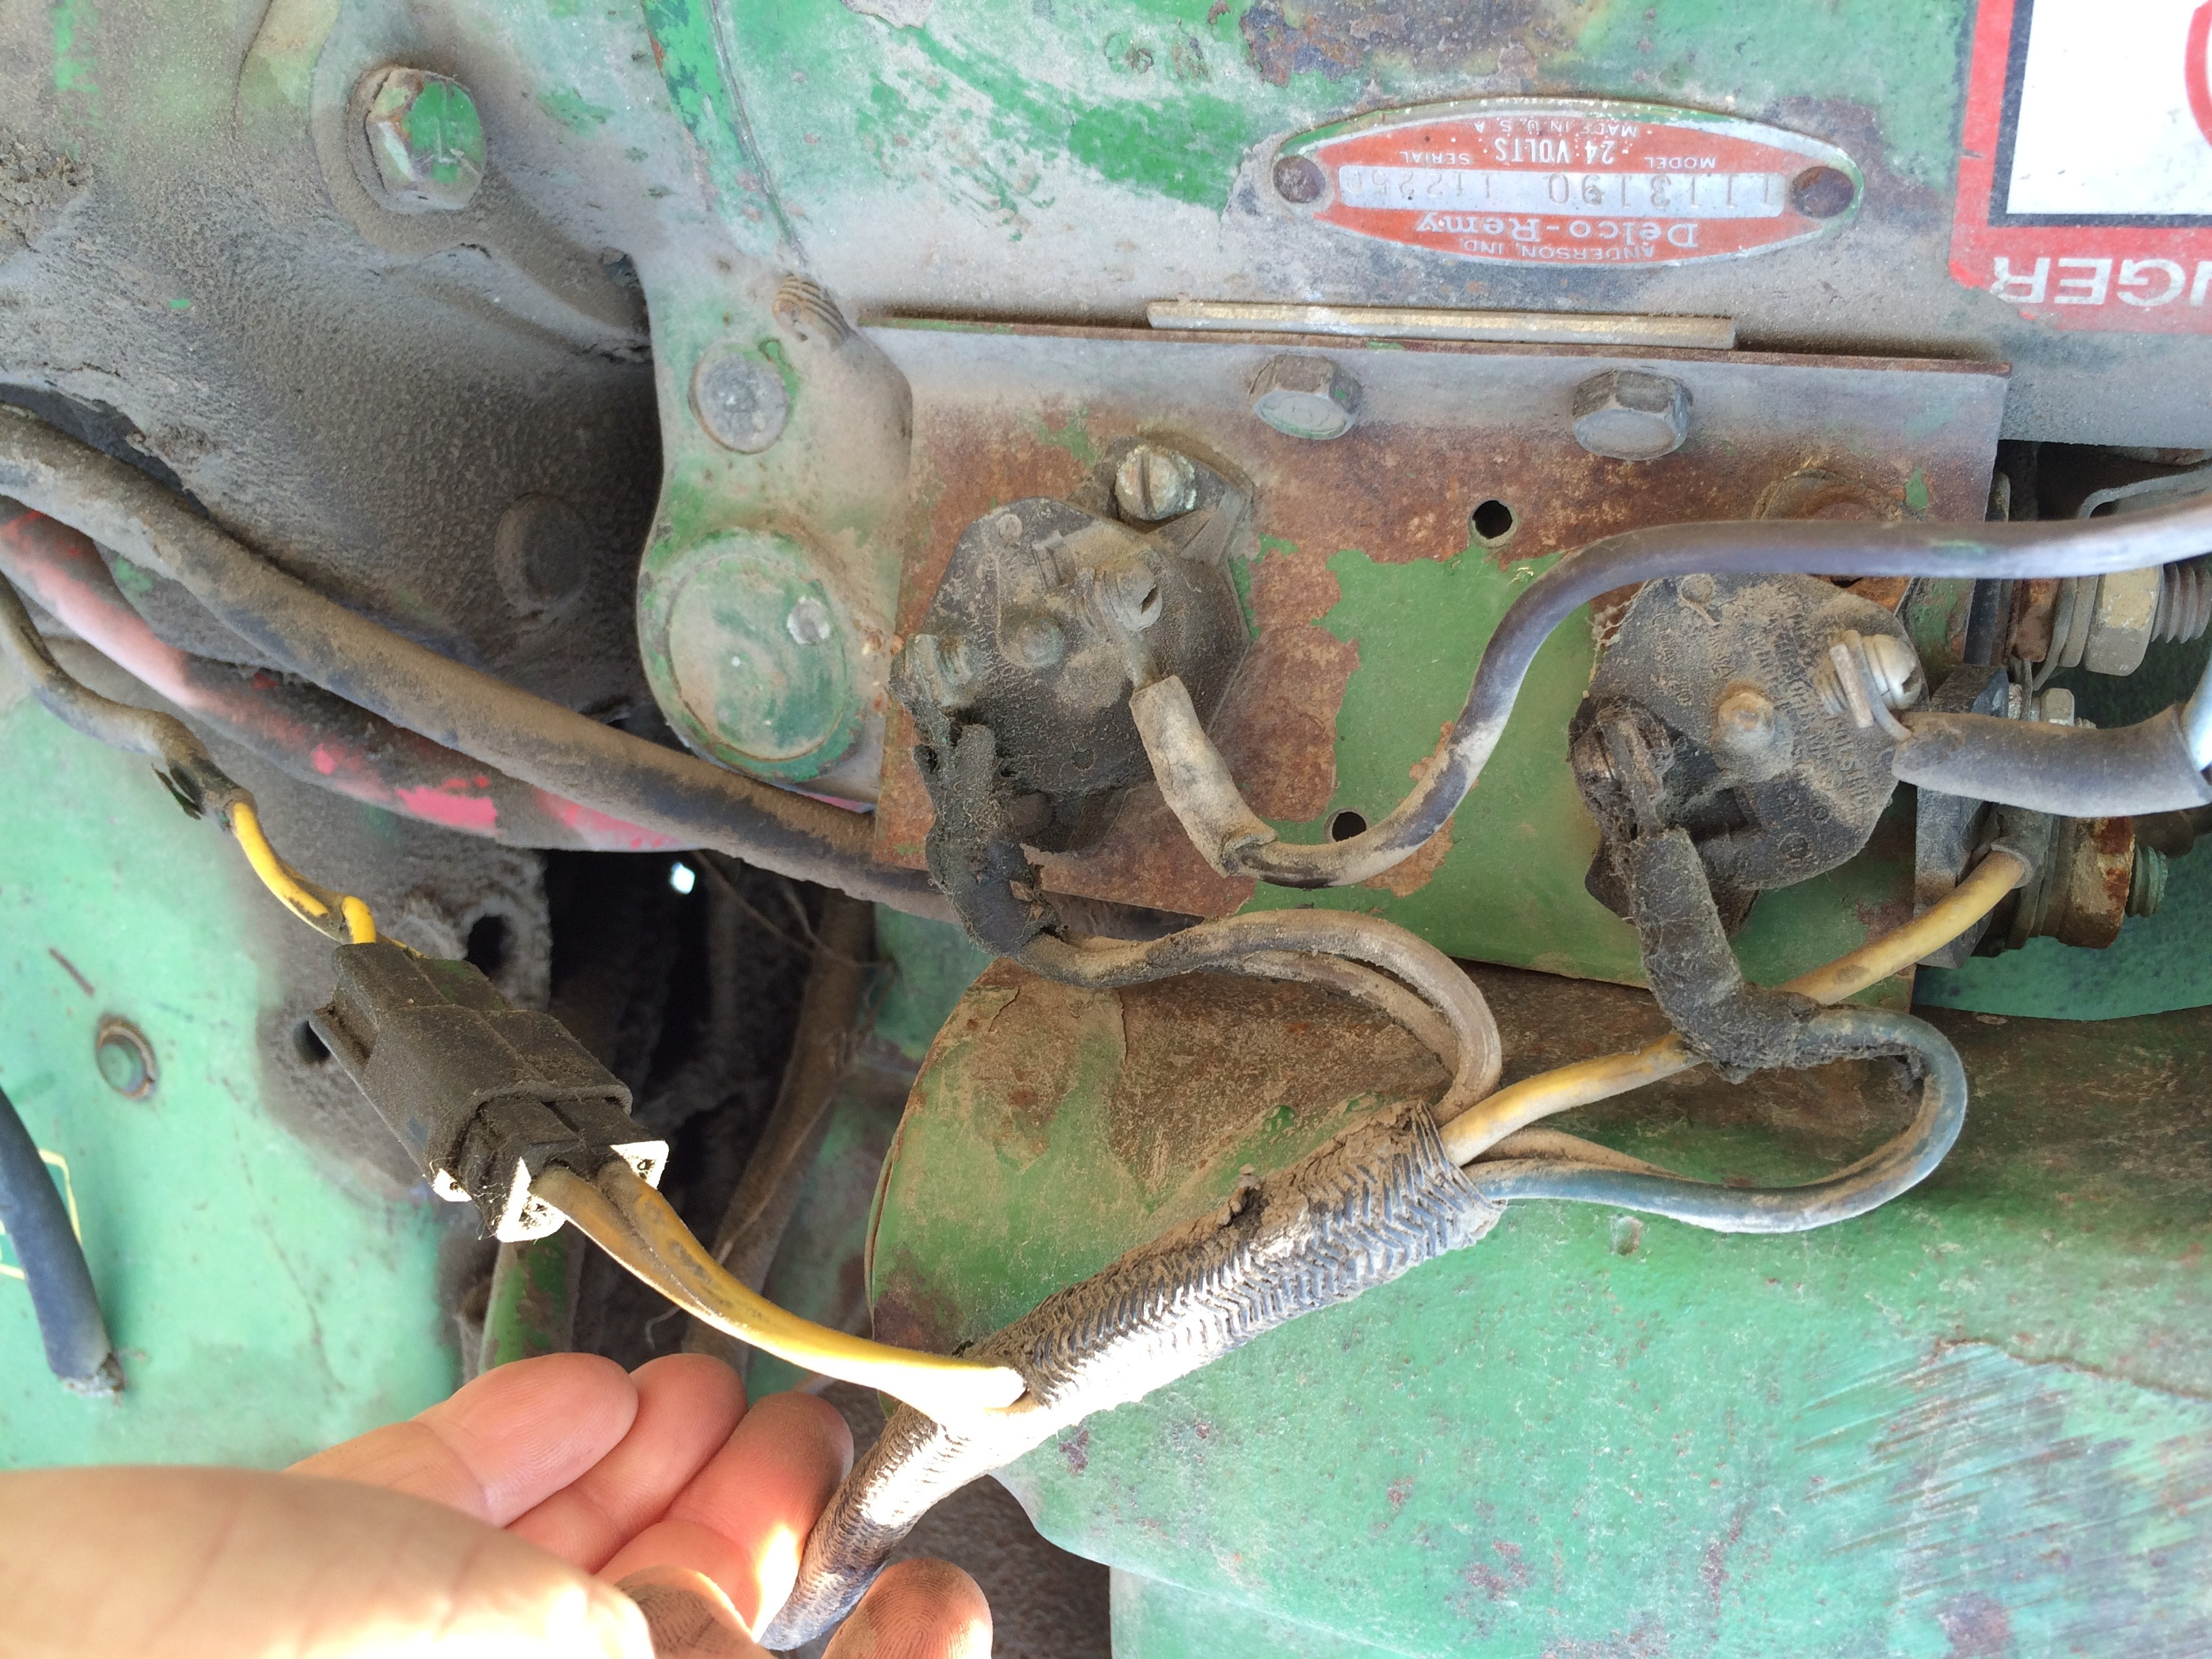 4020 John Deere Silinoid to Stater Wireing 12voalt Photos 4020 Starter Problem 24volt Of 4020 John Deere Silinoid to Stater Wireing 12voalt Photos